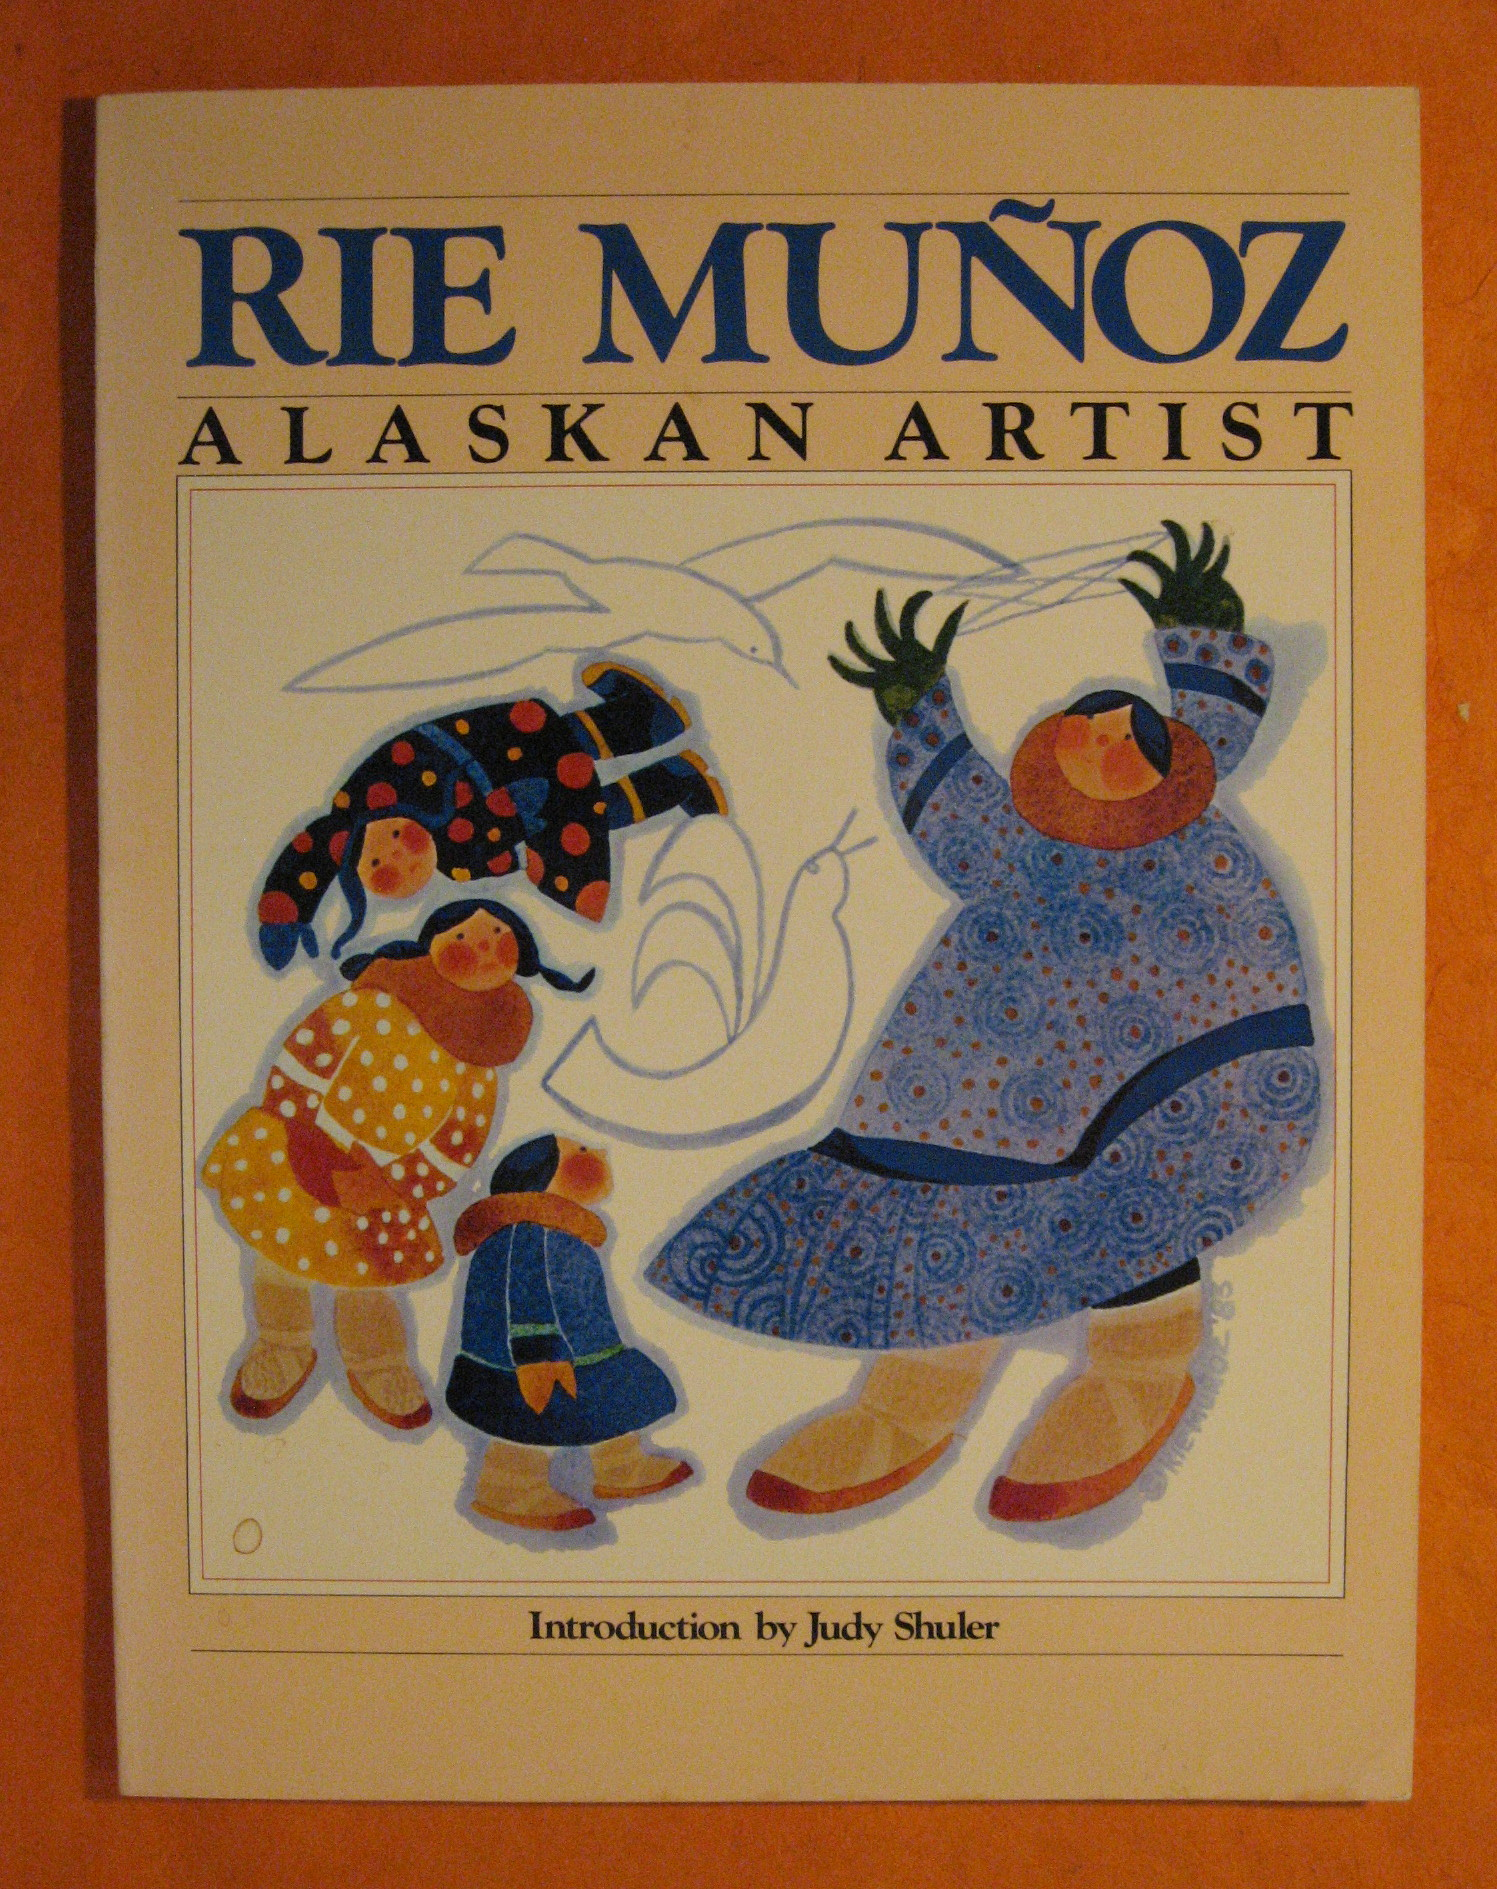 Rie Munoz: Alaskan Artist, Munoz, Rie